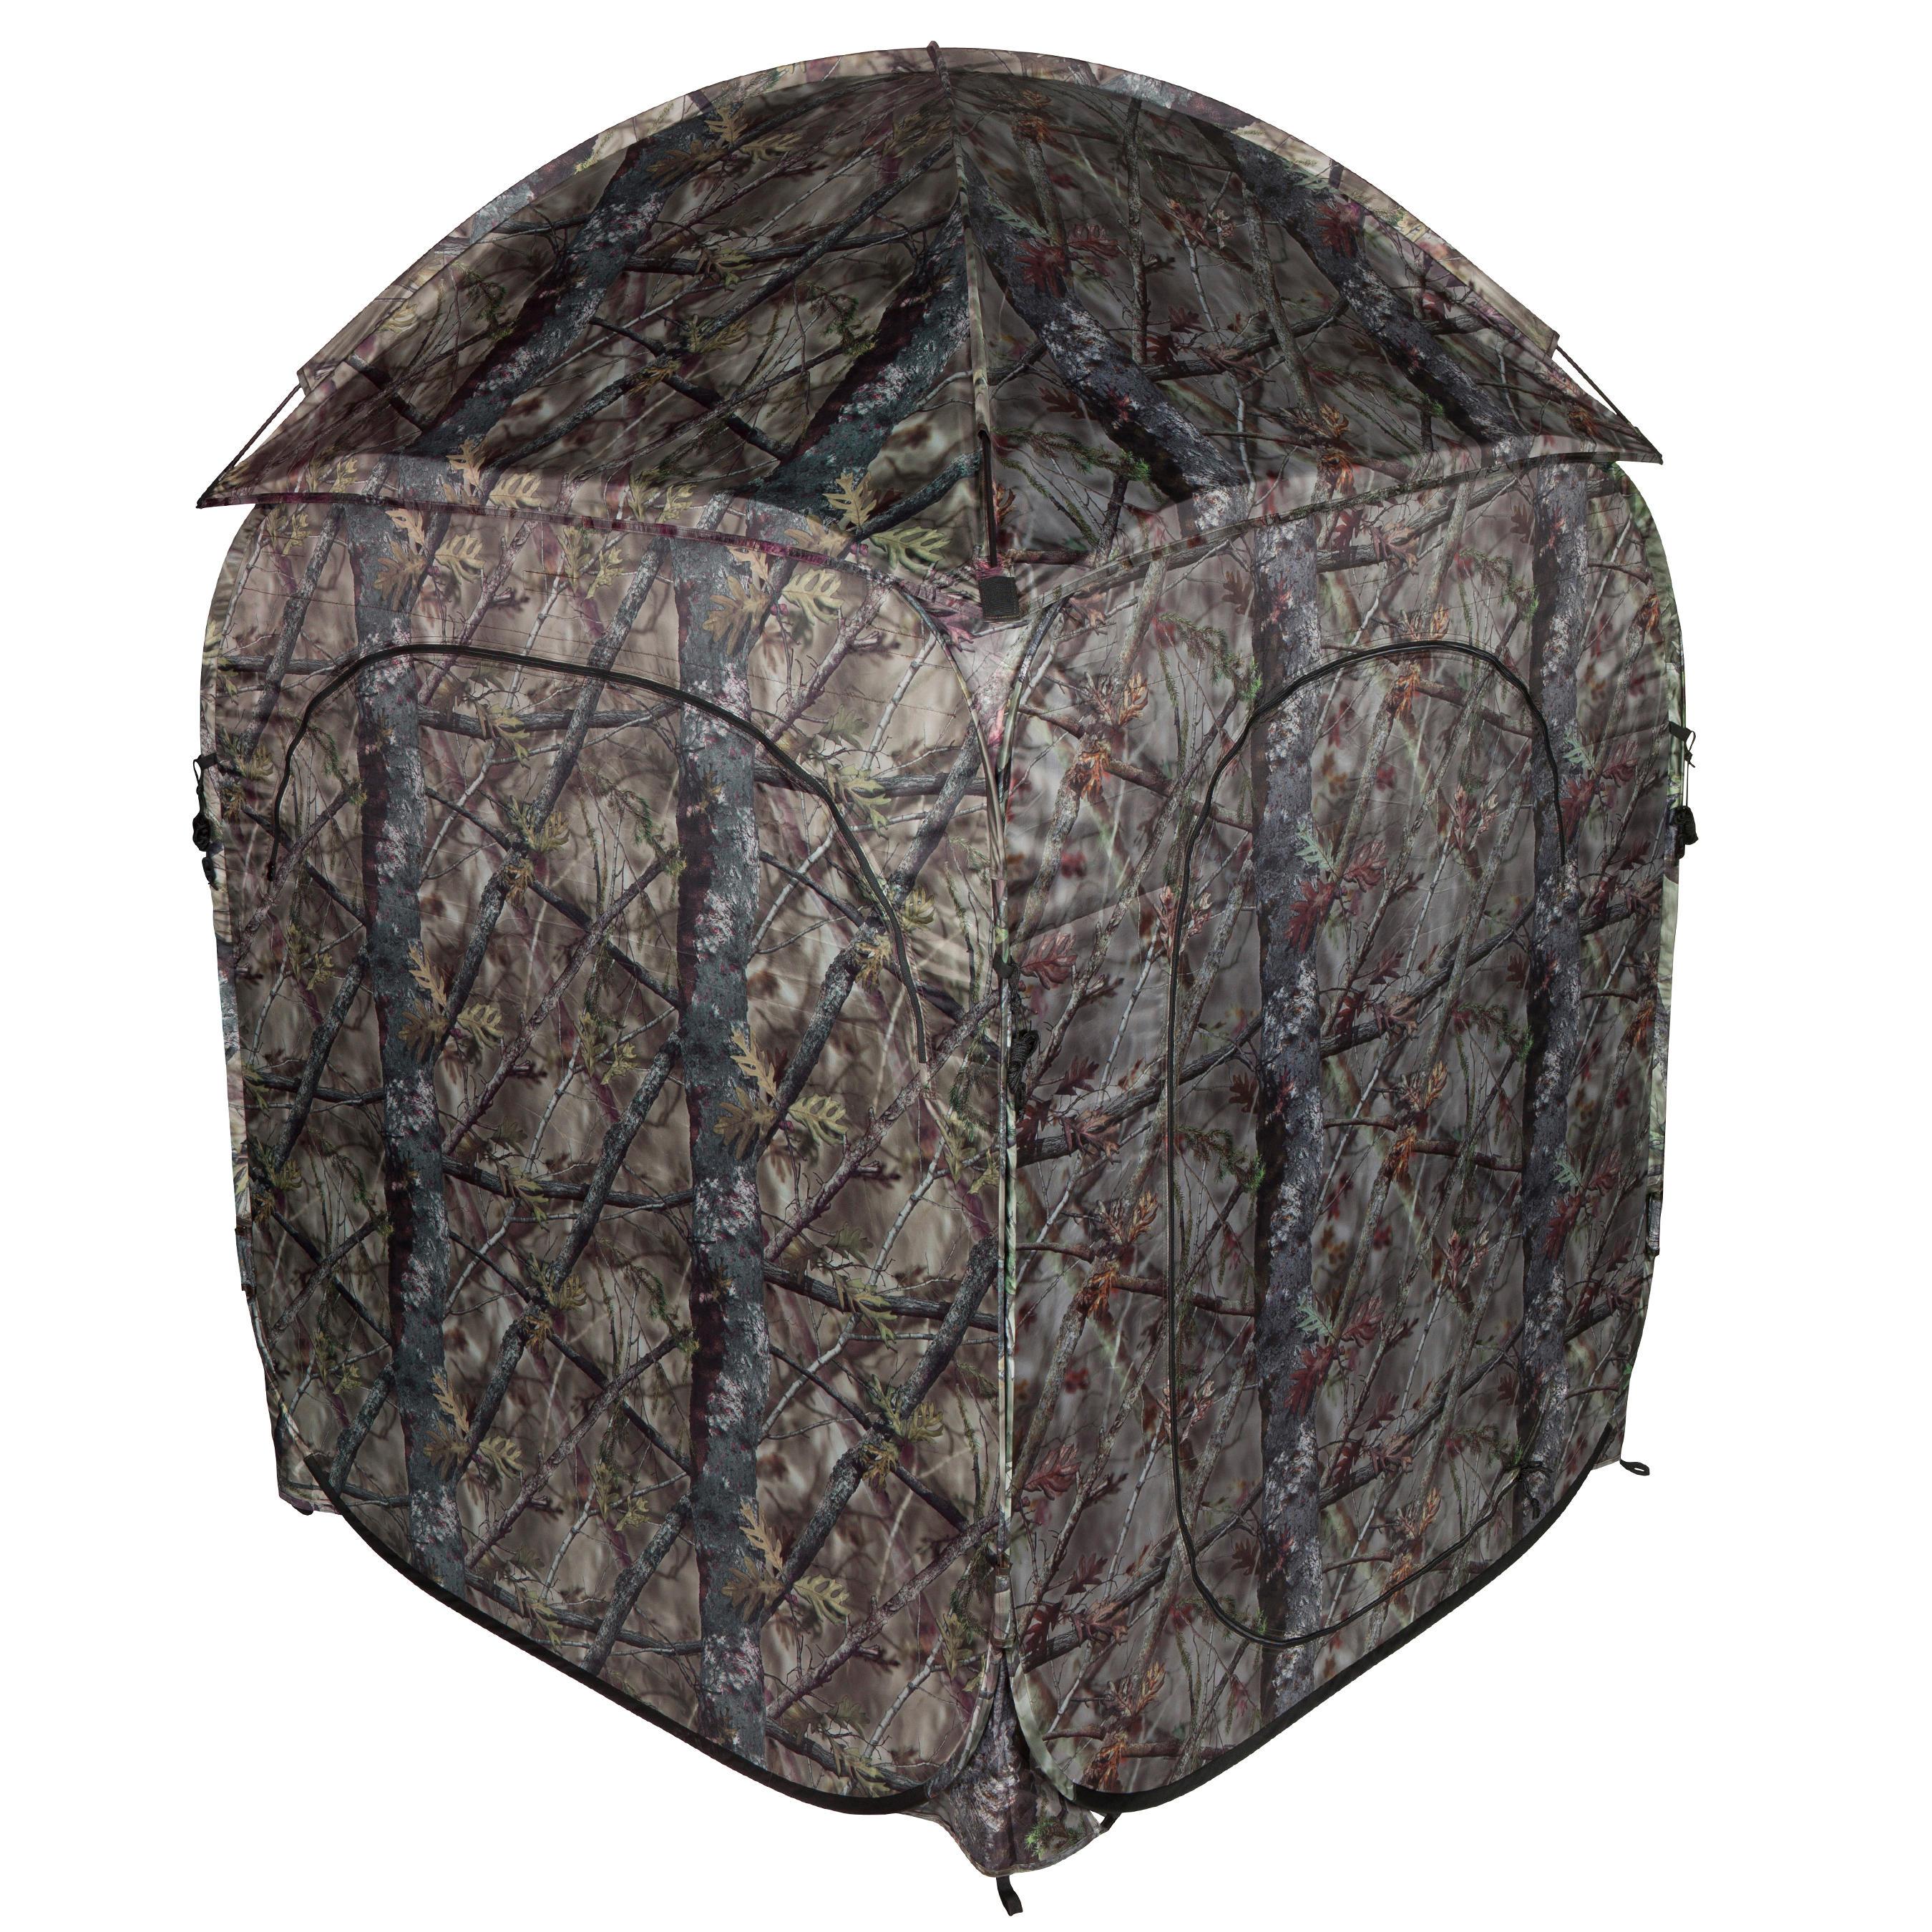 Ansitz-Zelt Jagd Tarnung Camouflage braun | 03583788884279